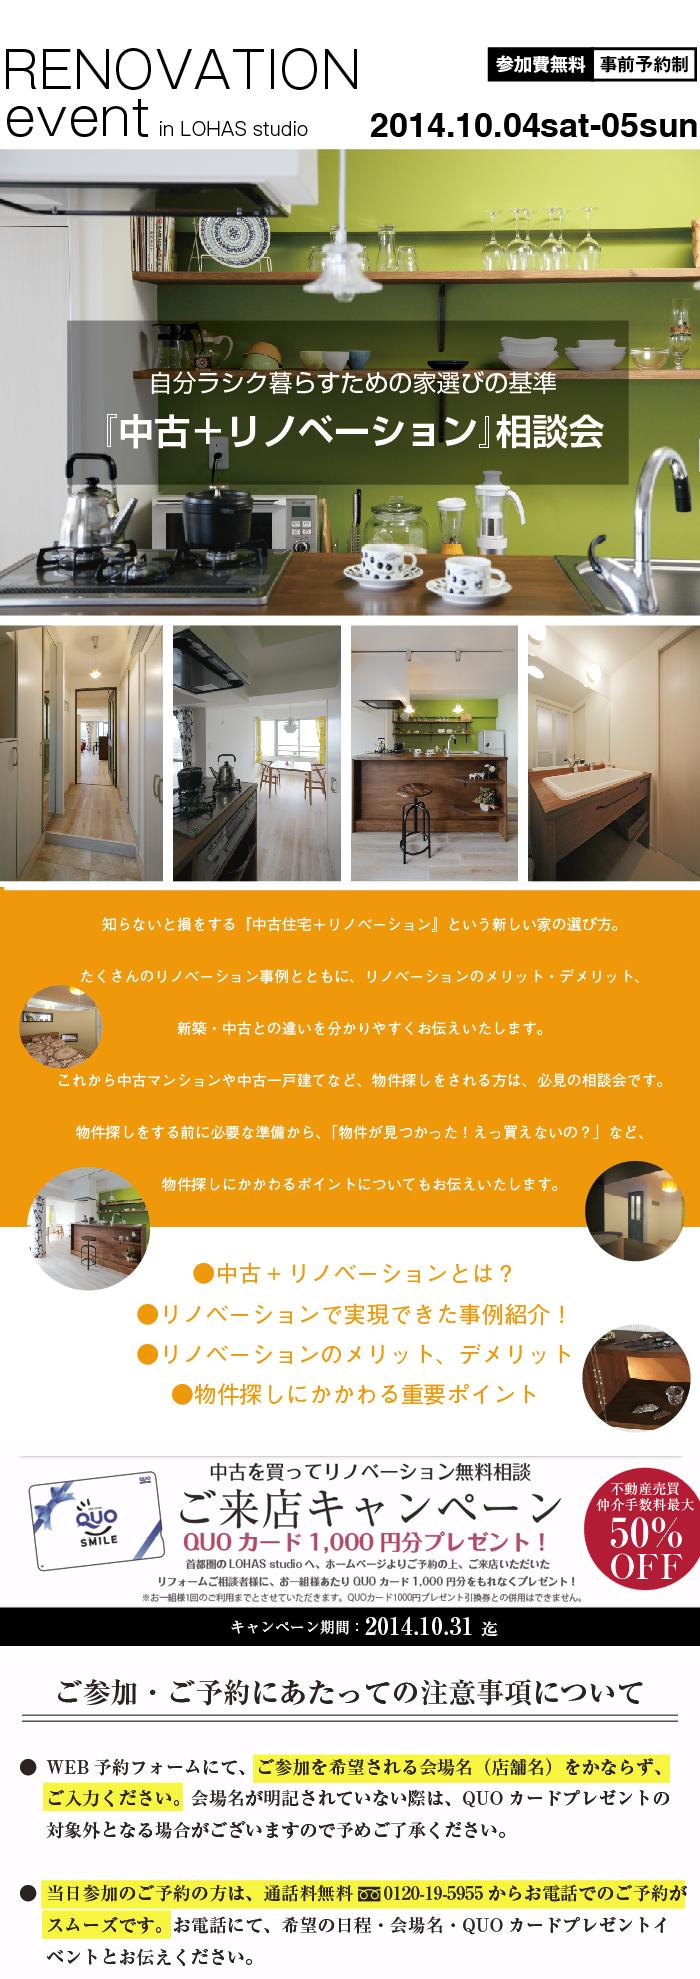 2014100405_renovation_event.png